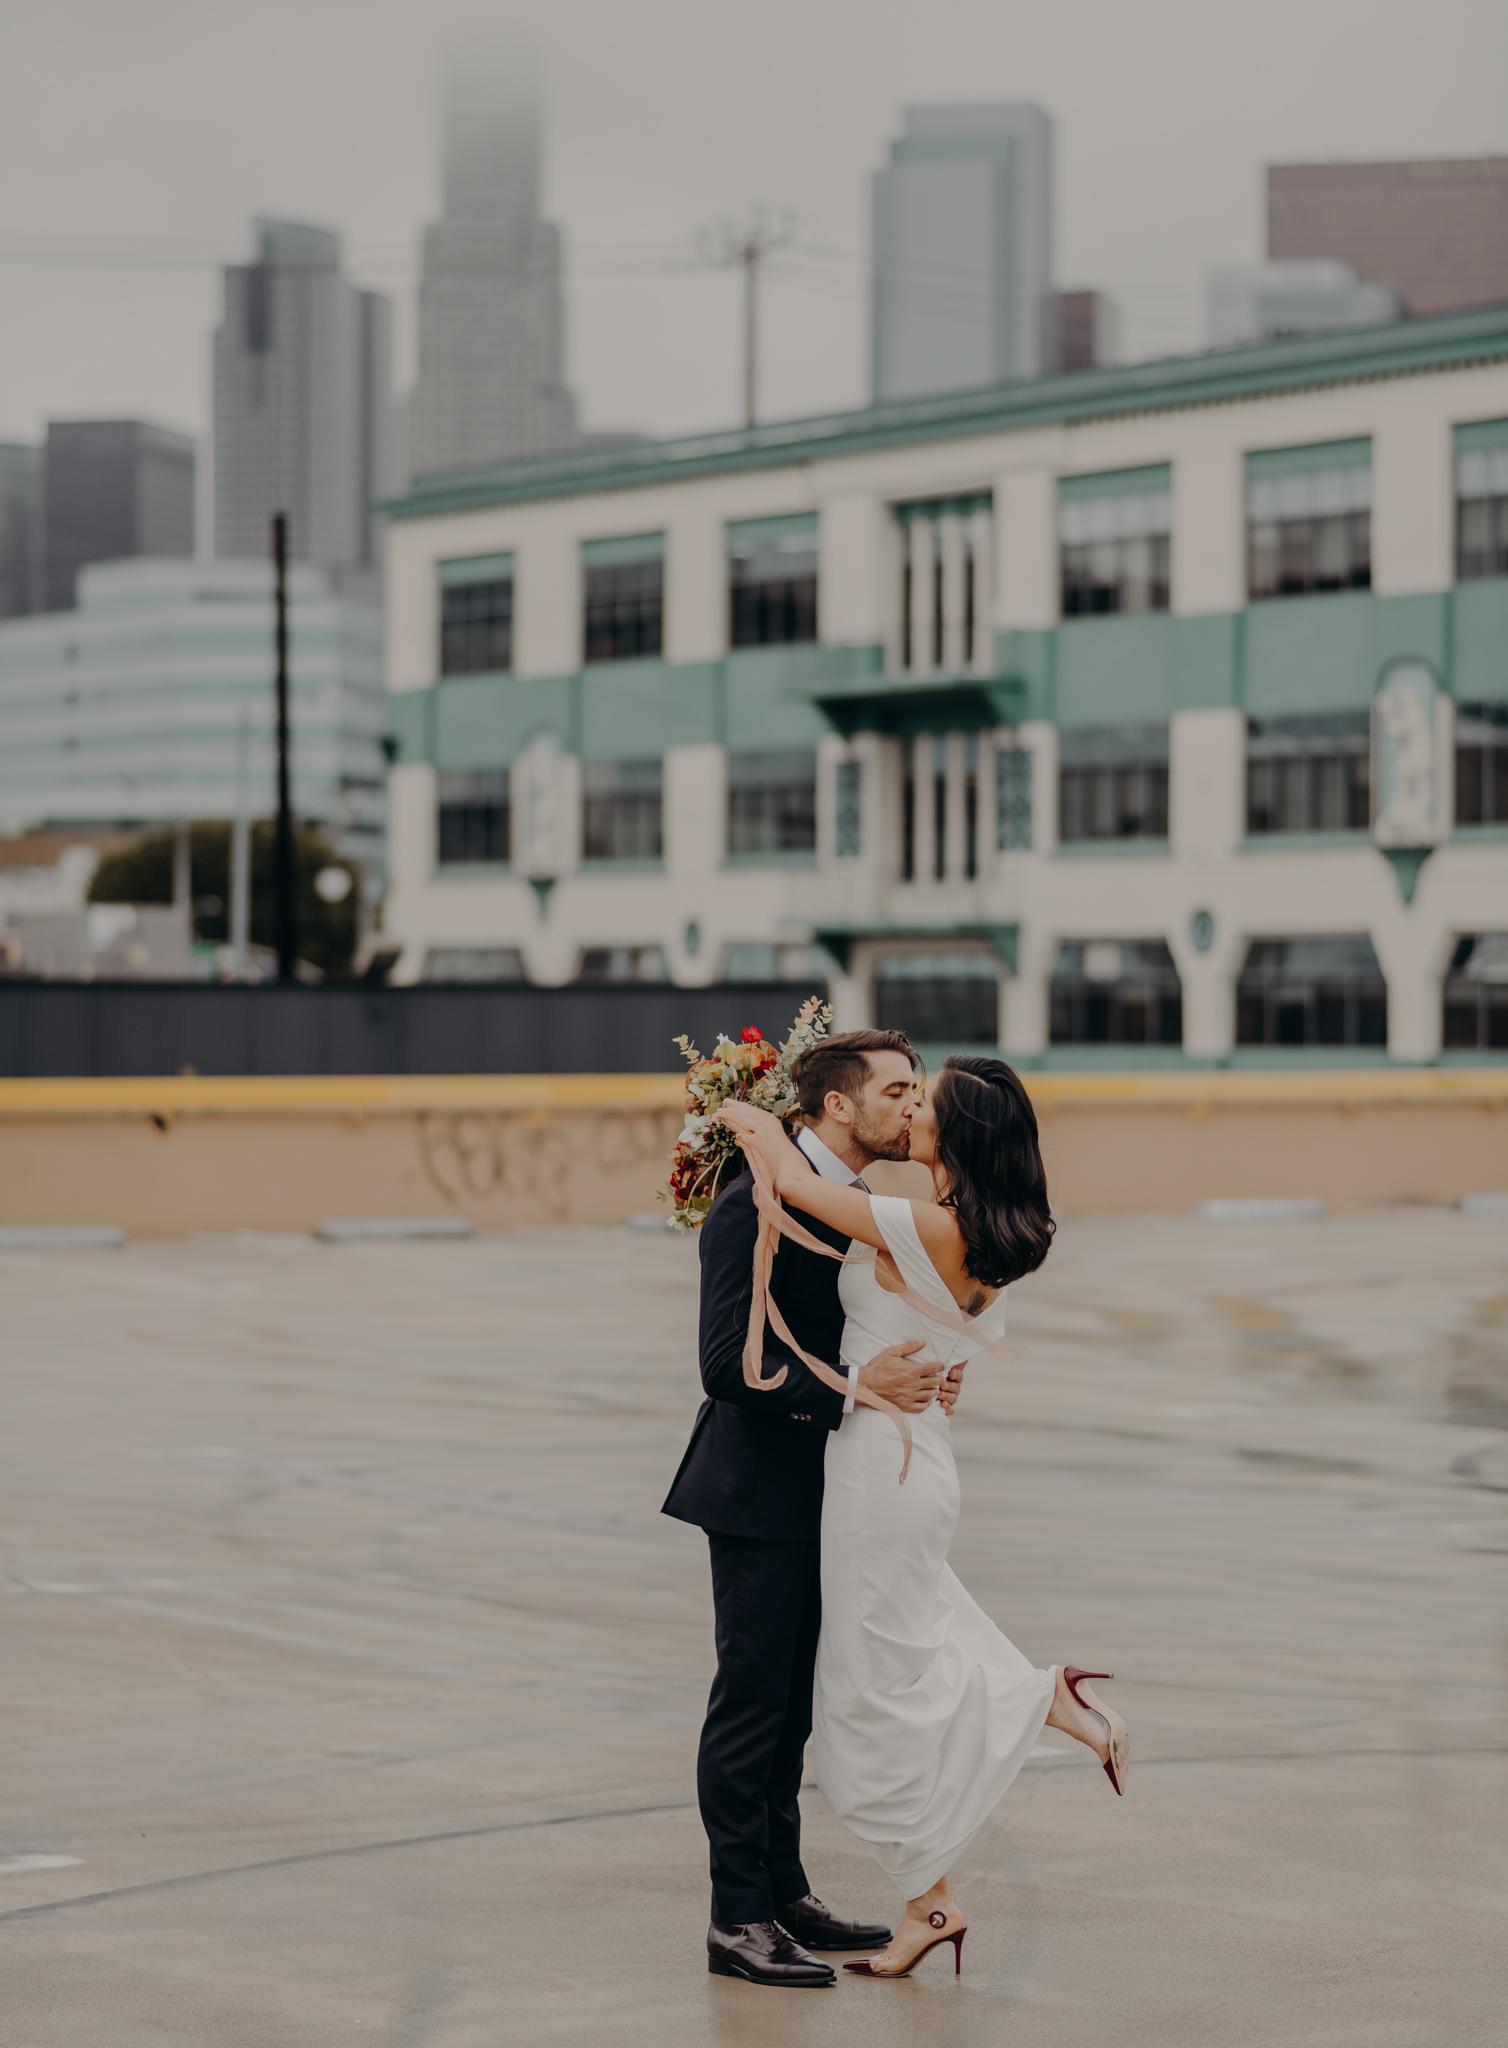 Wedding Photo LA - wedding photographer in los angeles - millwick wedding venue -isaiahandtaylor.com-071.jpg